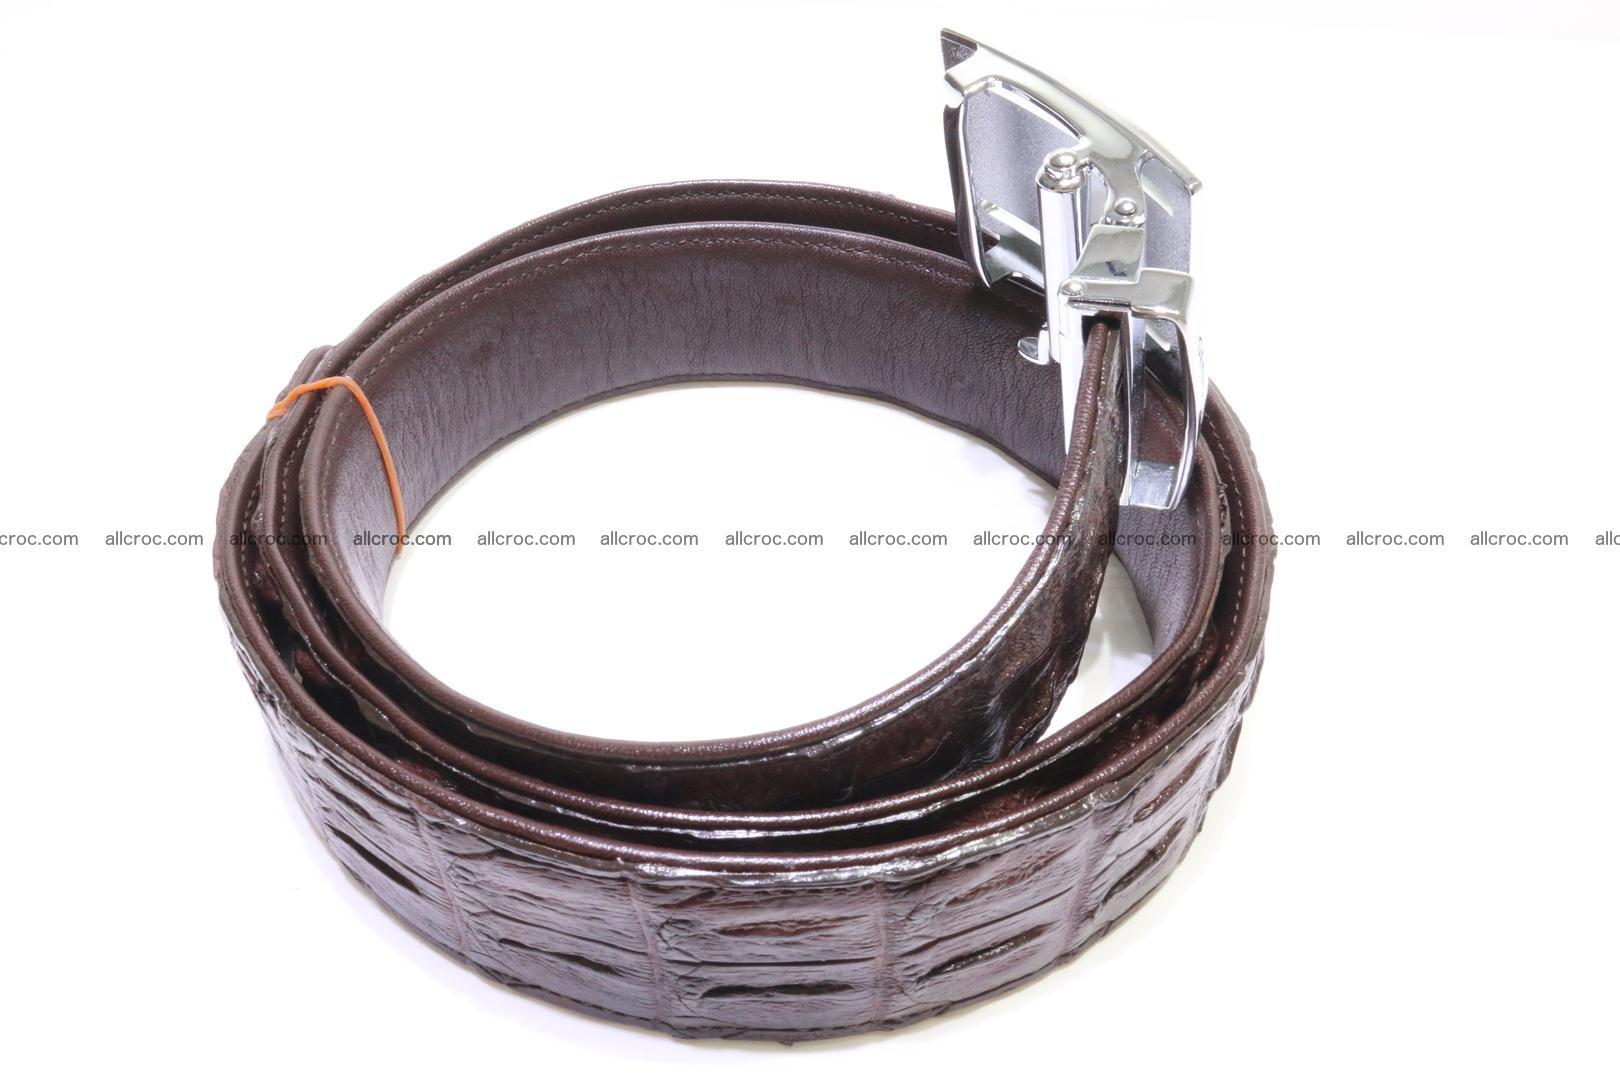 Genuine Crocodile leather double row Hornback belt 008 Foto 1